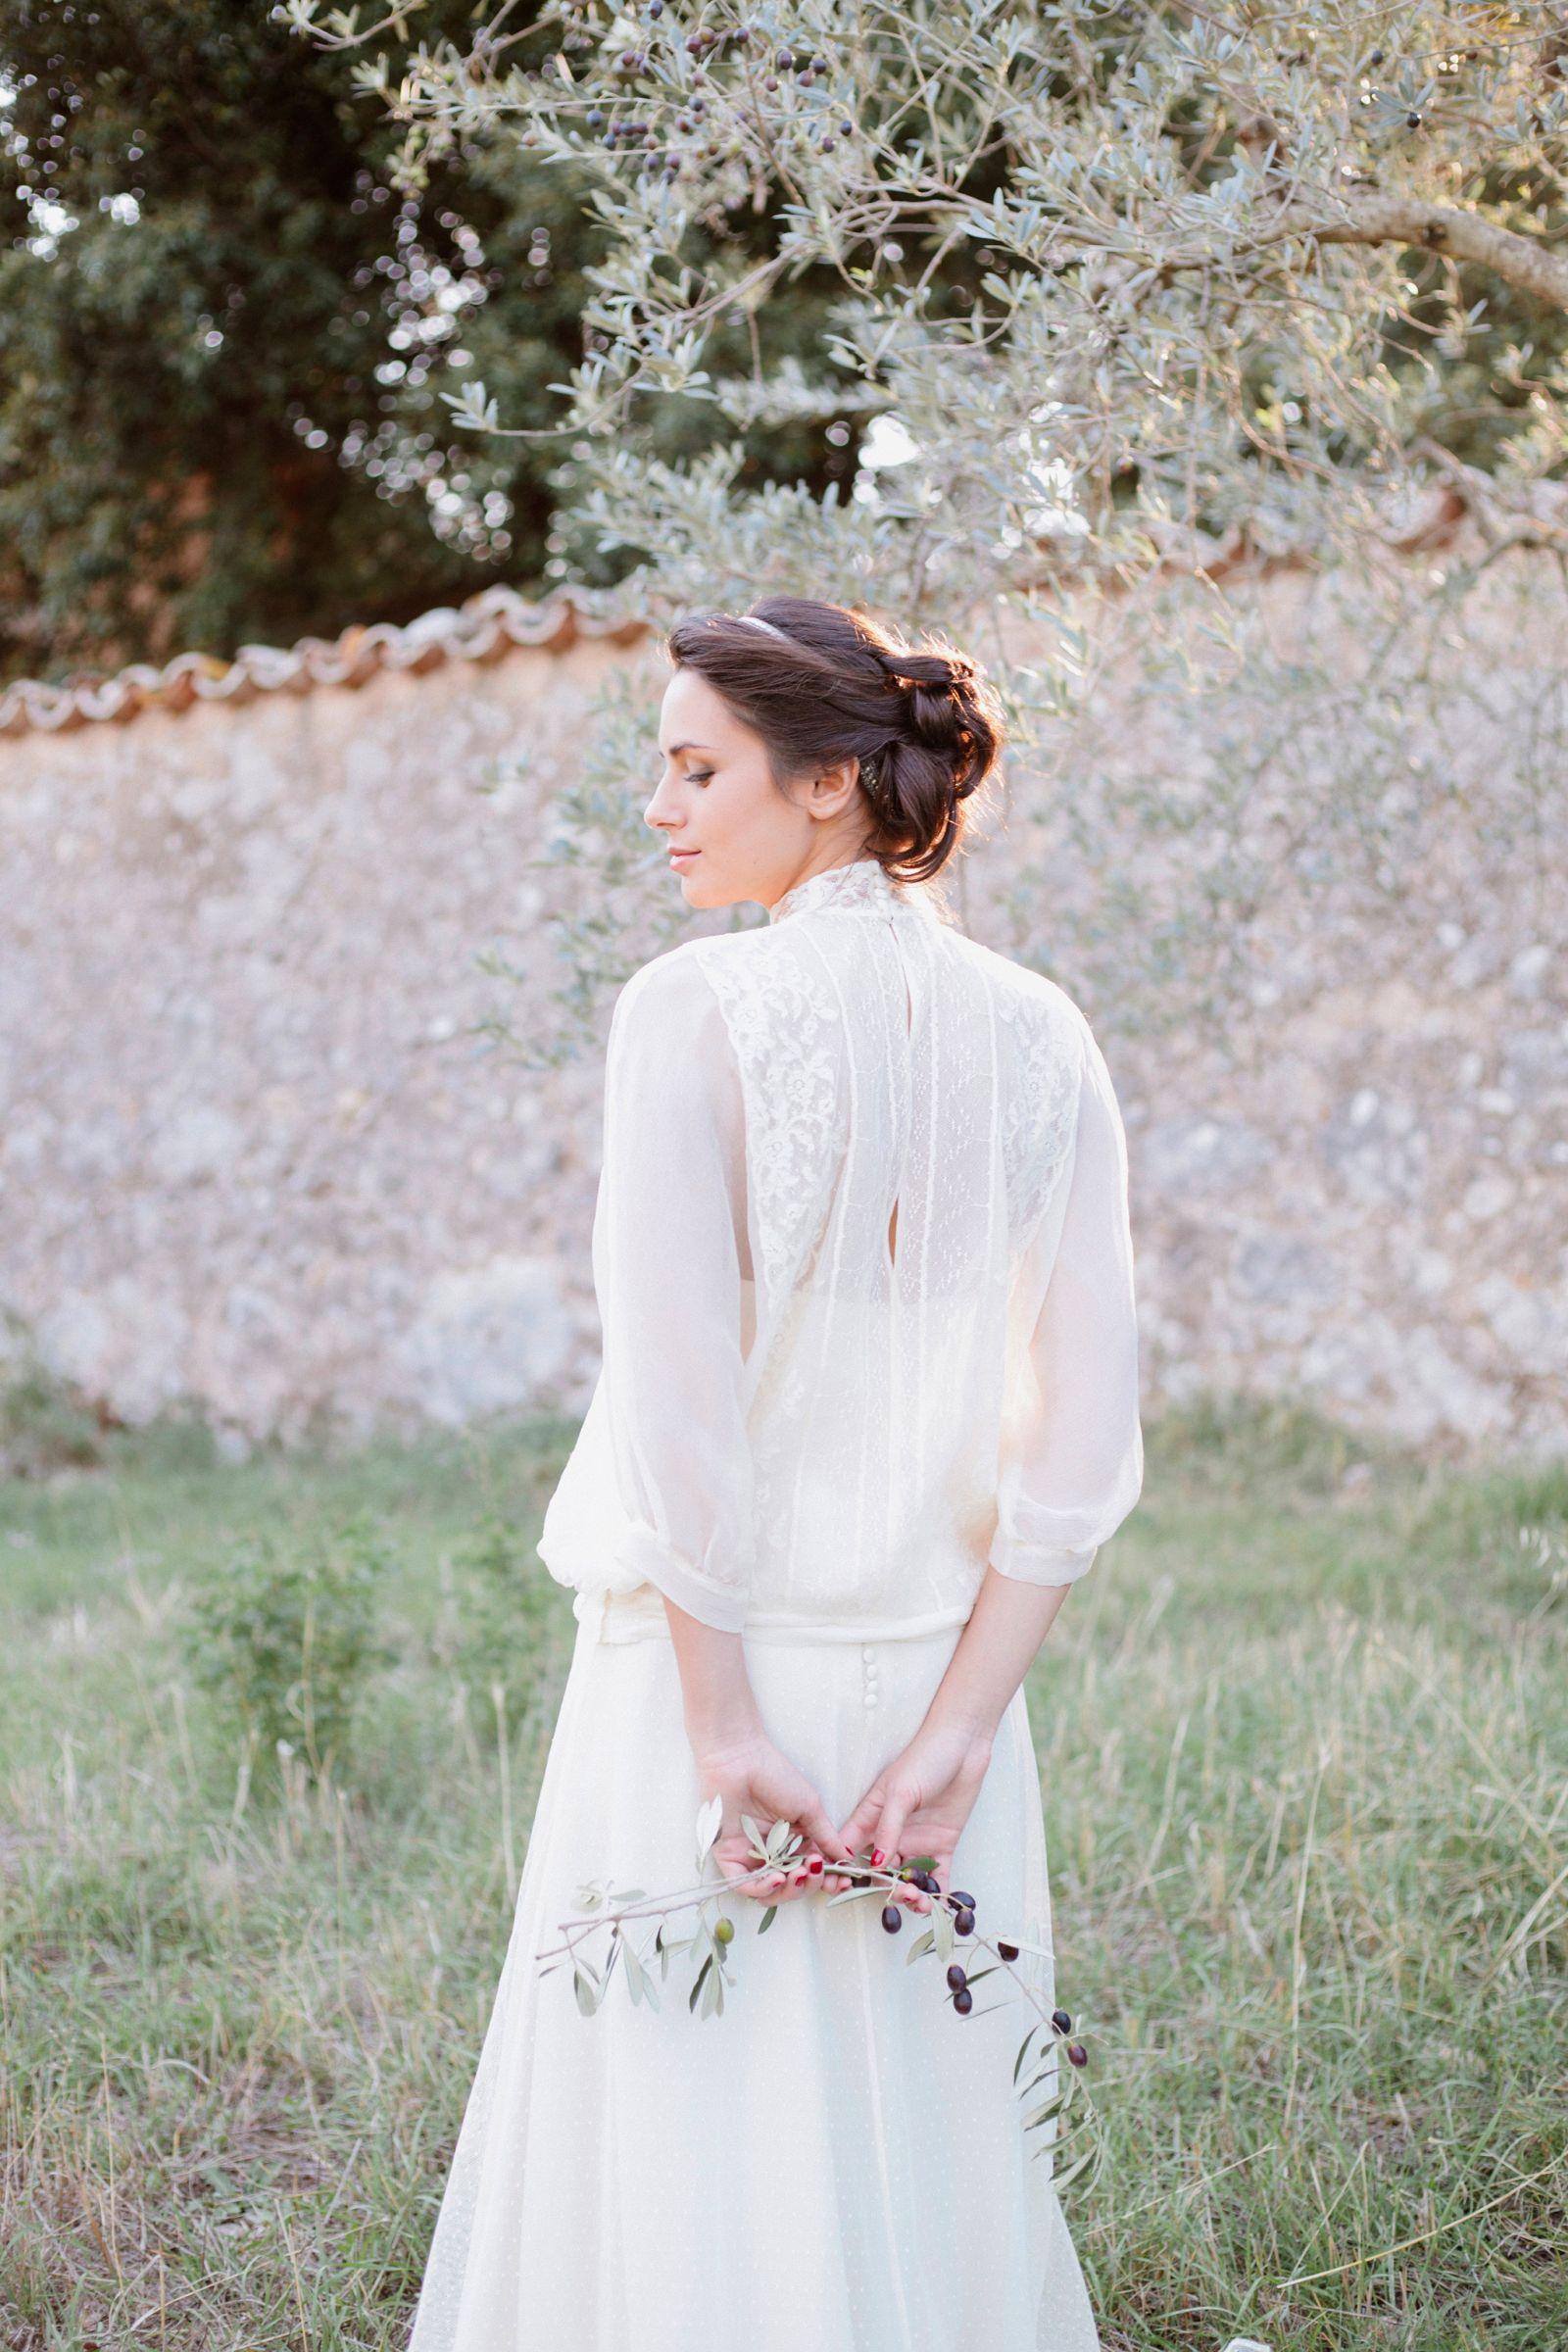 Organic bridal inspiration amongst the rolling hills of Umbria ...